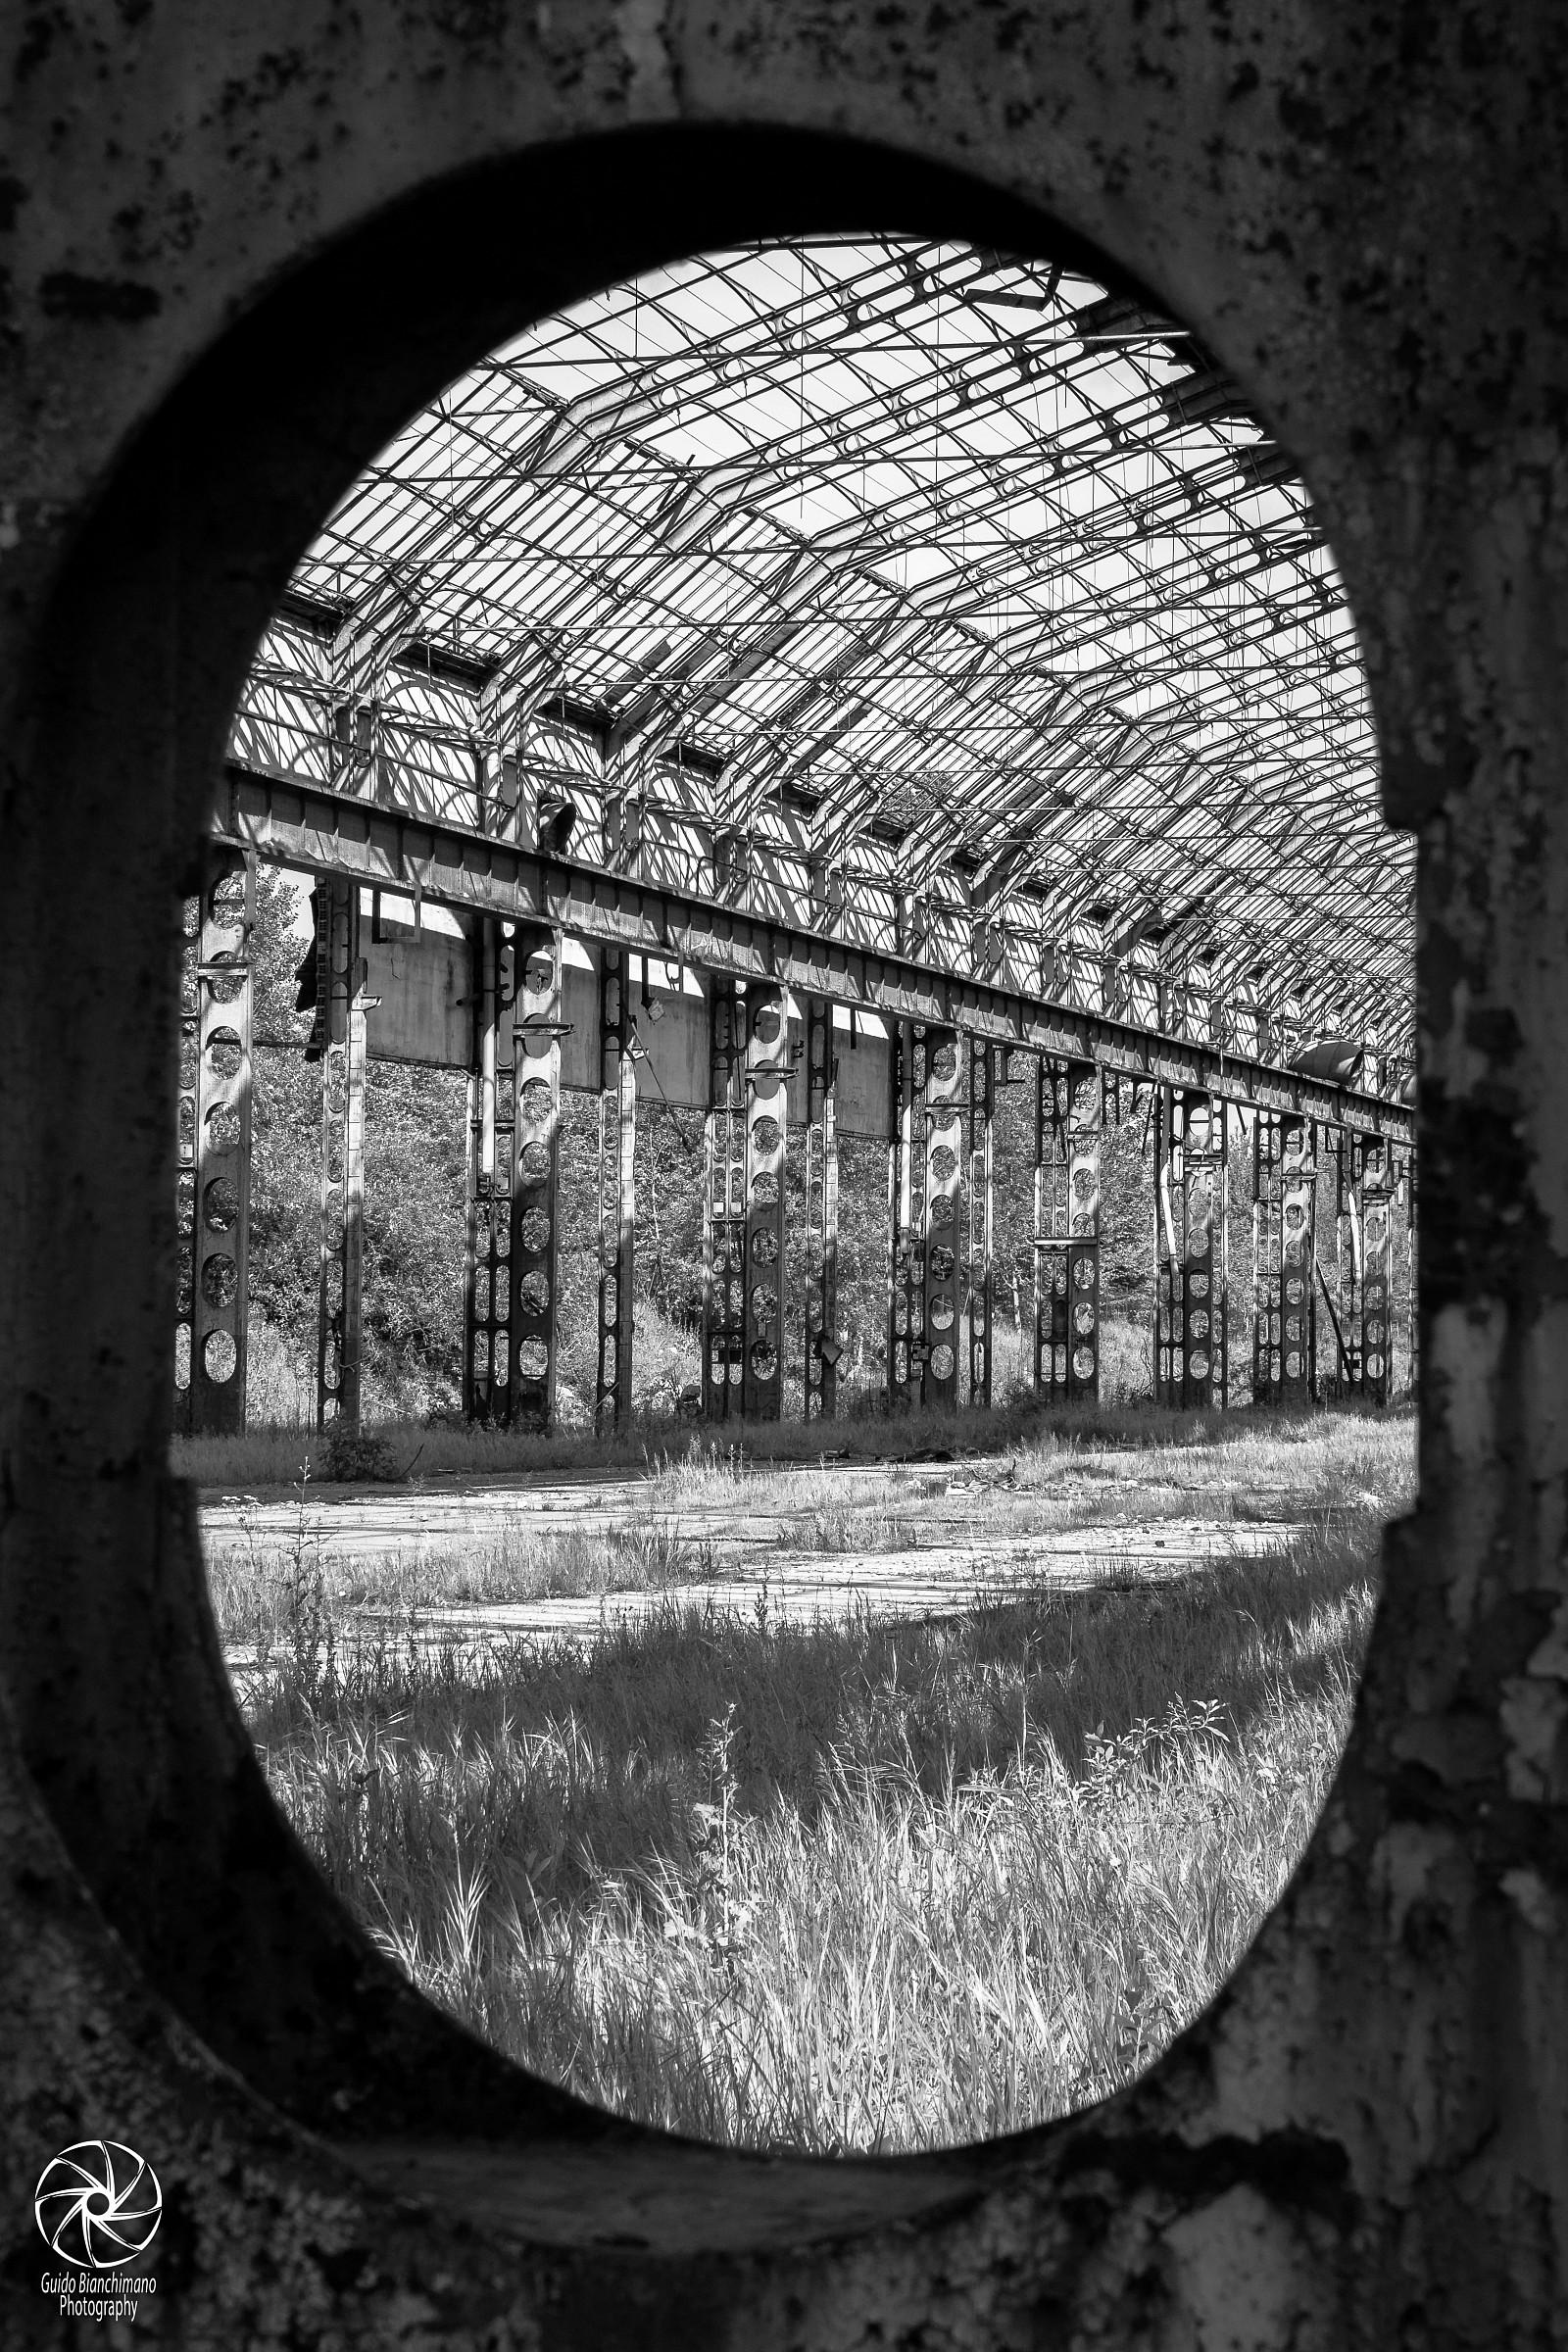 Among the abandoned warehouses Lambrate 3...